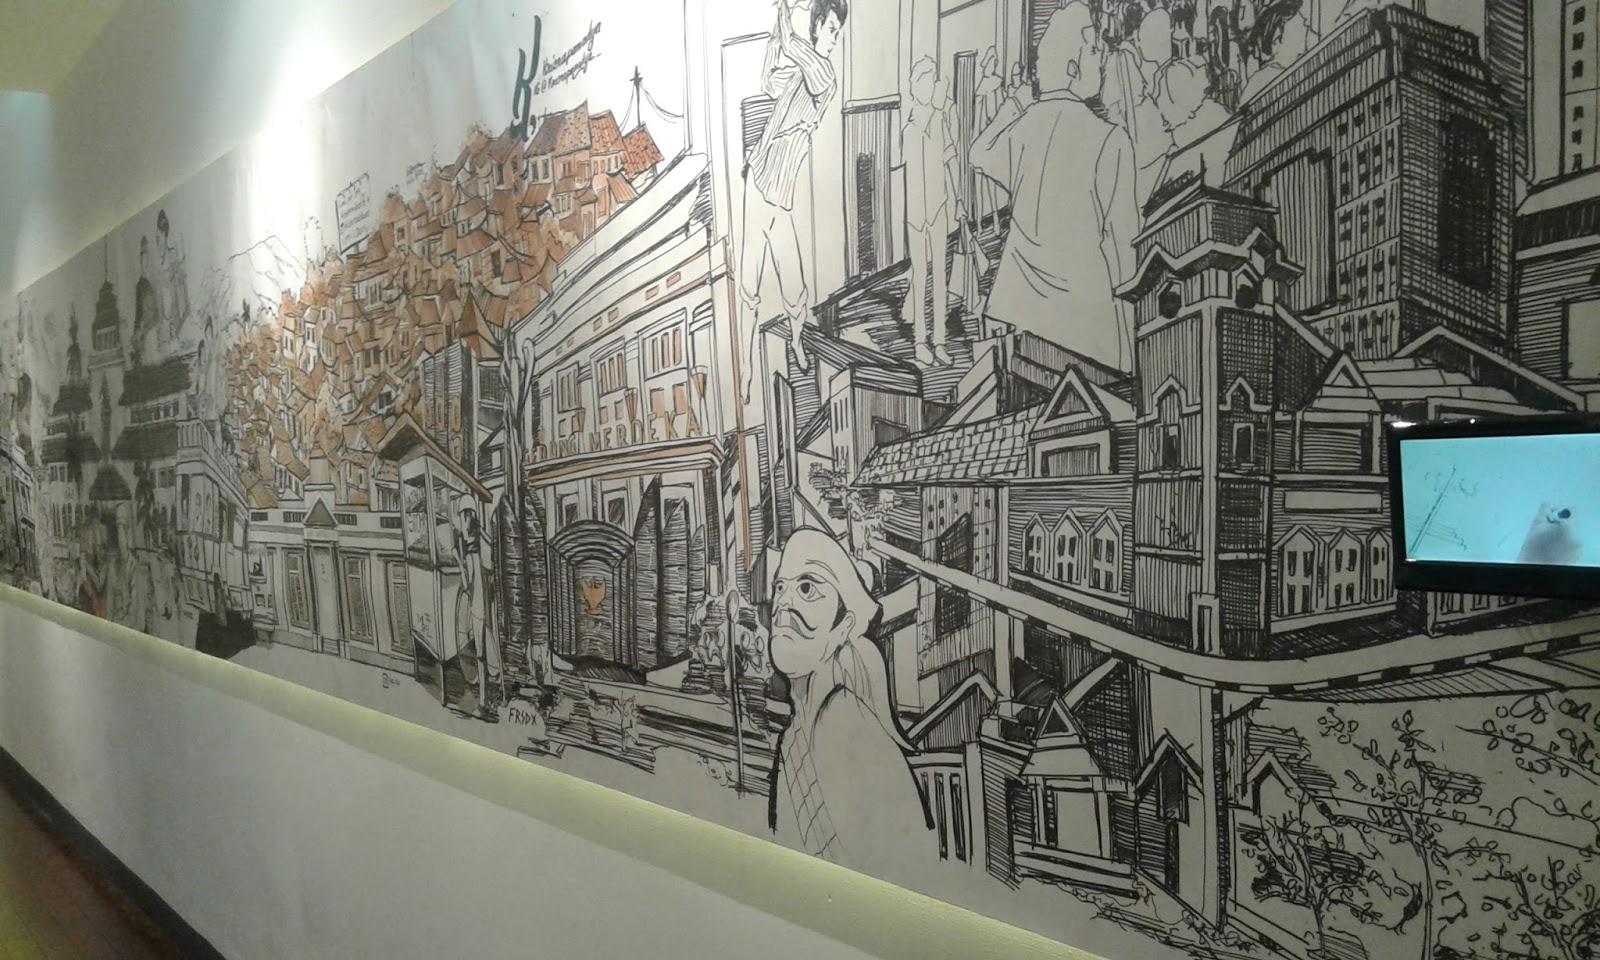 Kumpulan Gambar Karikatur Gedung Sate Terbaru Kolek Gambar